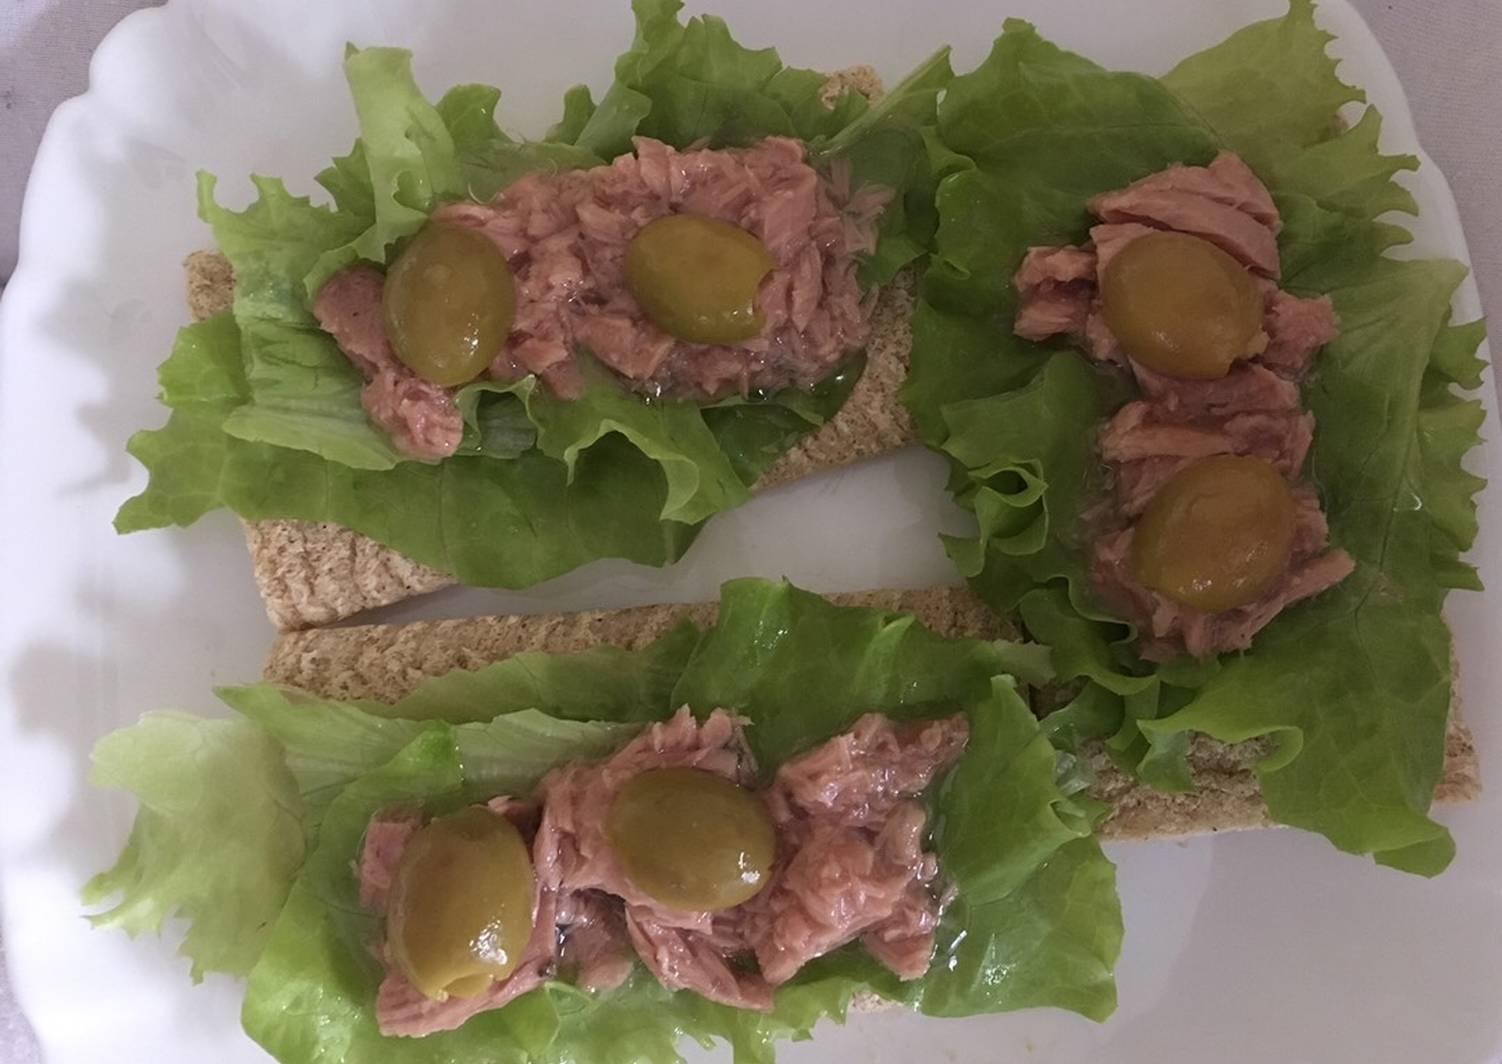 картинка бутерброд с листьями салата